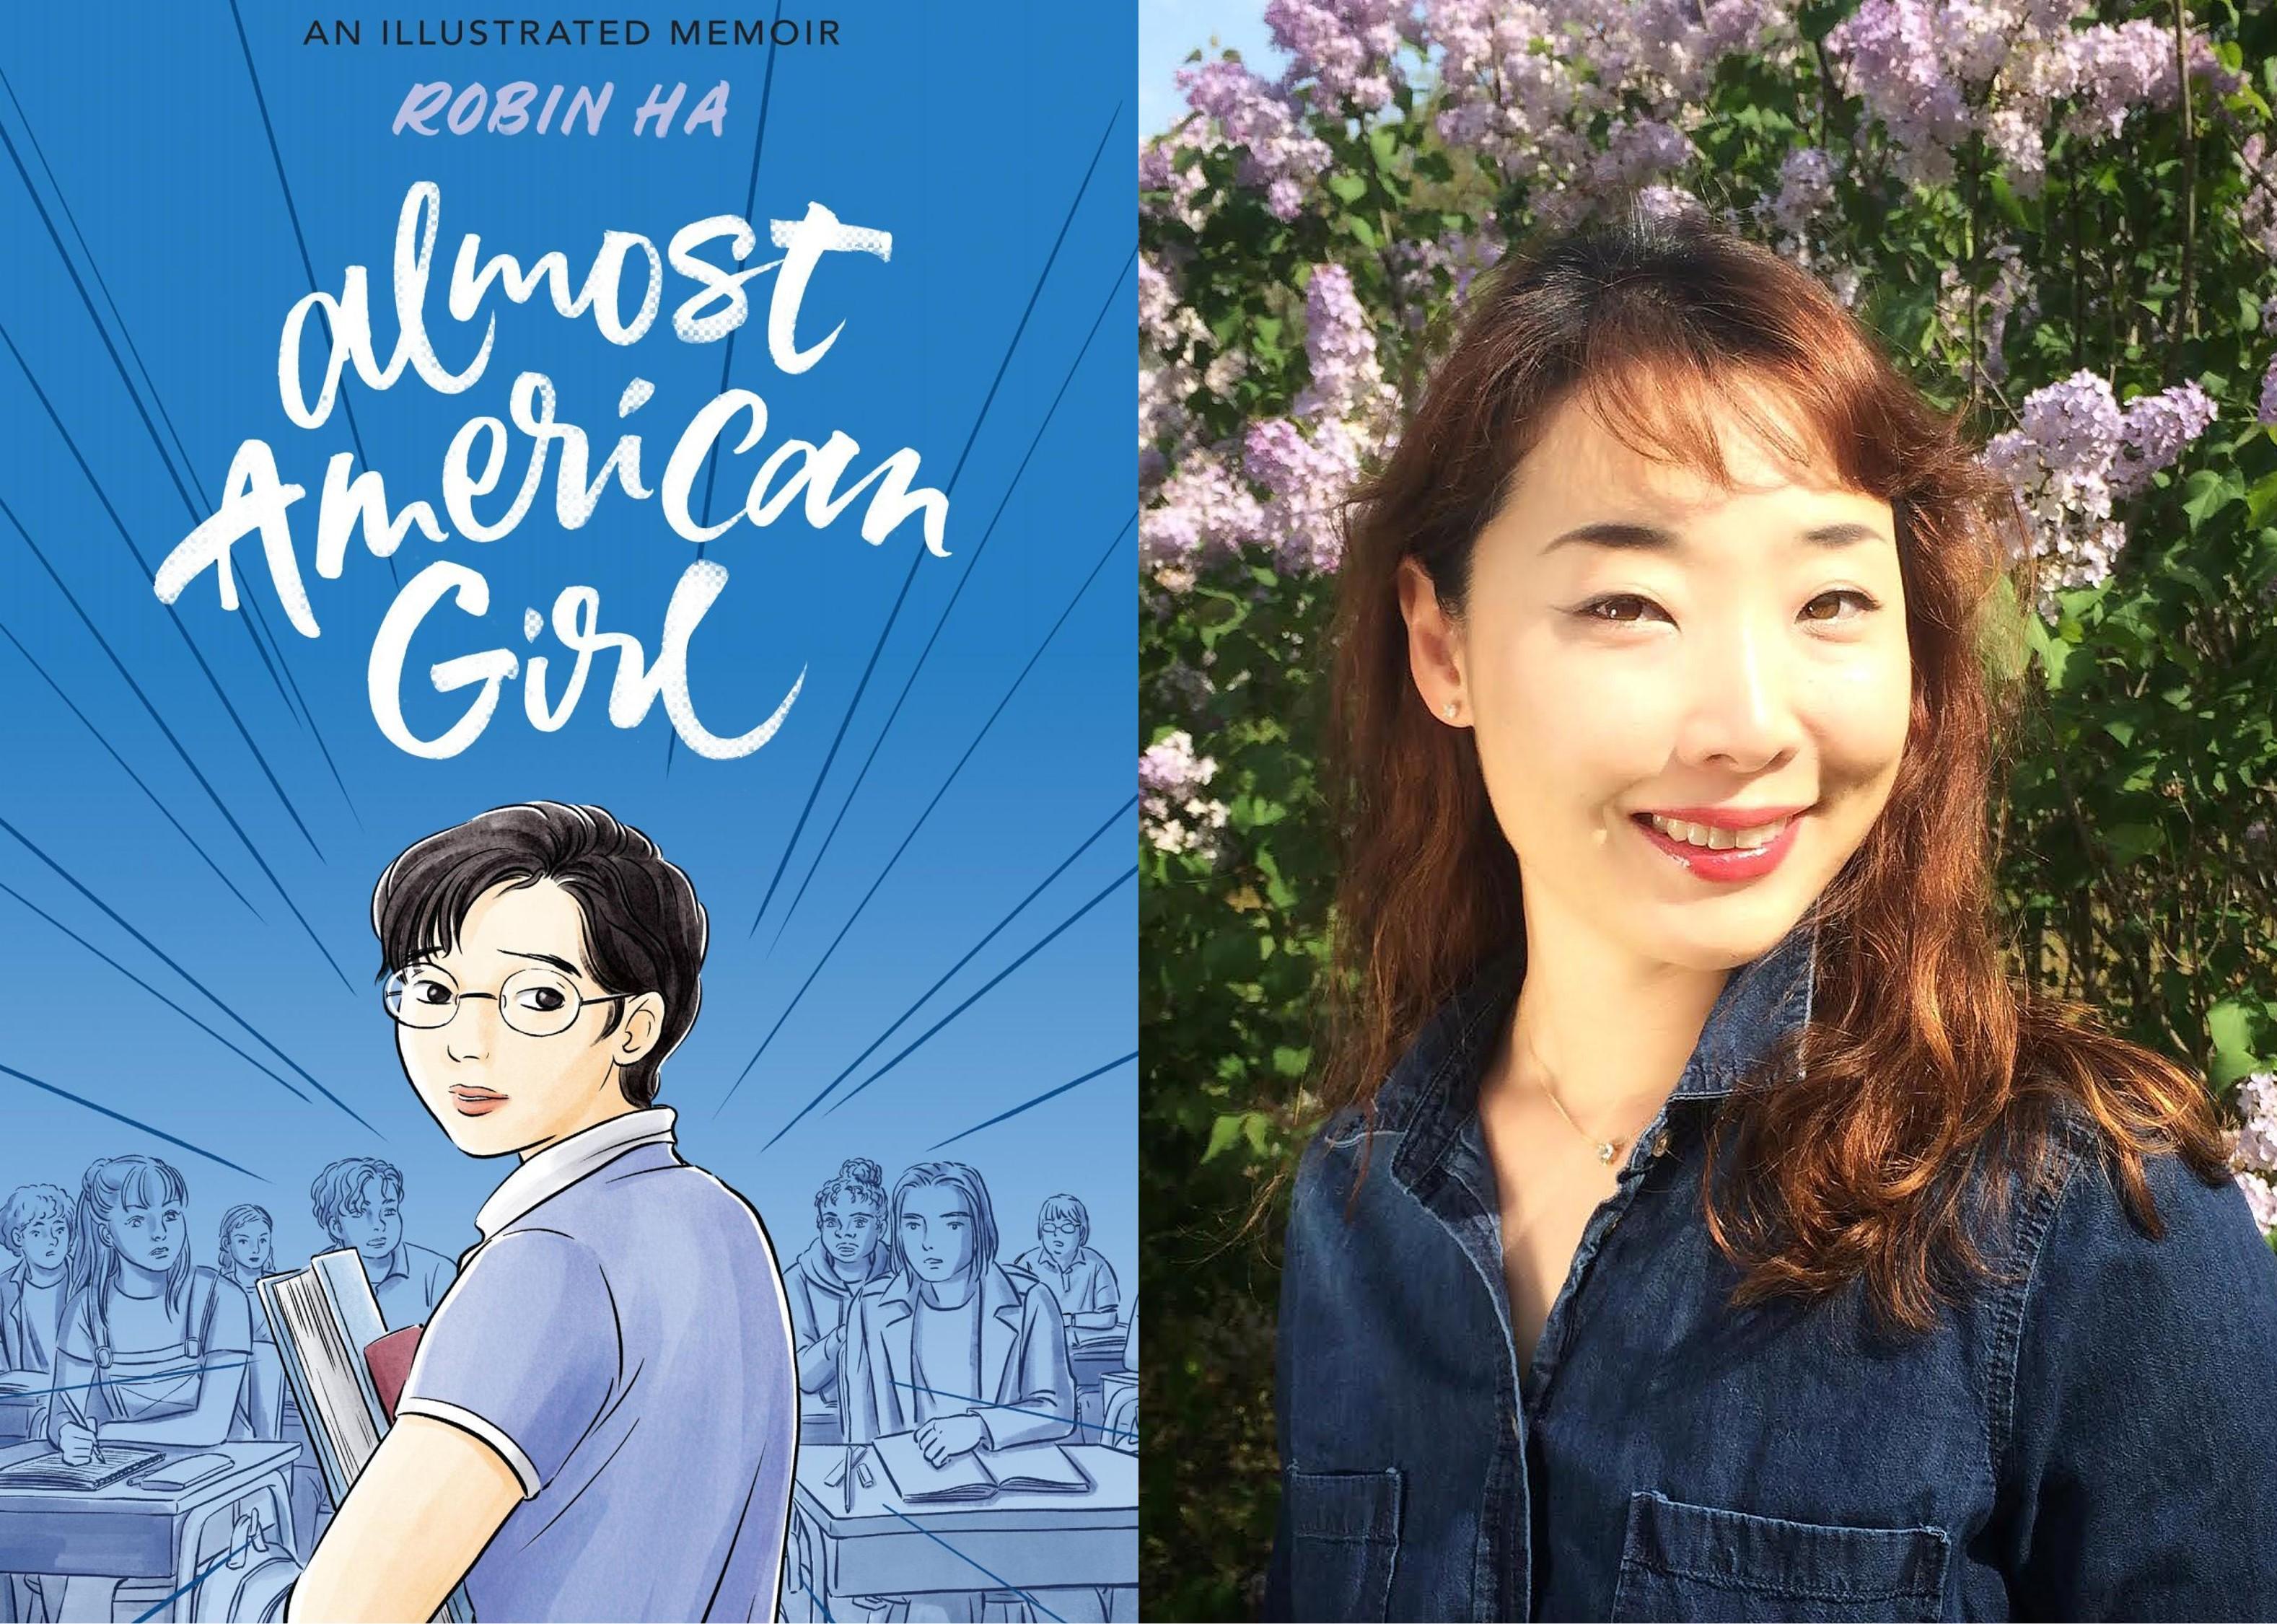 Diary Comics with Robin Ha